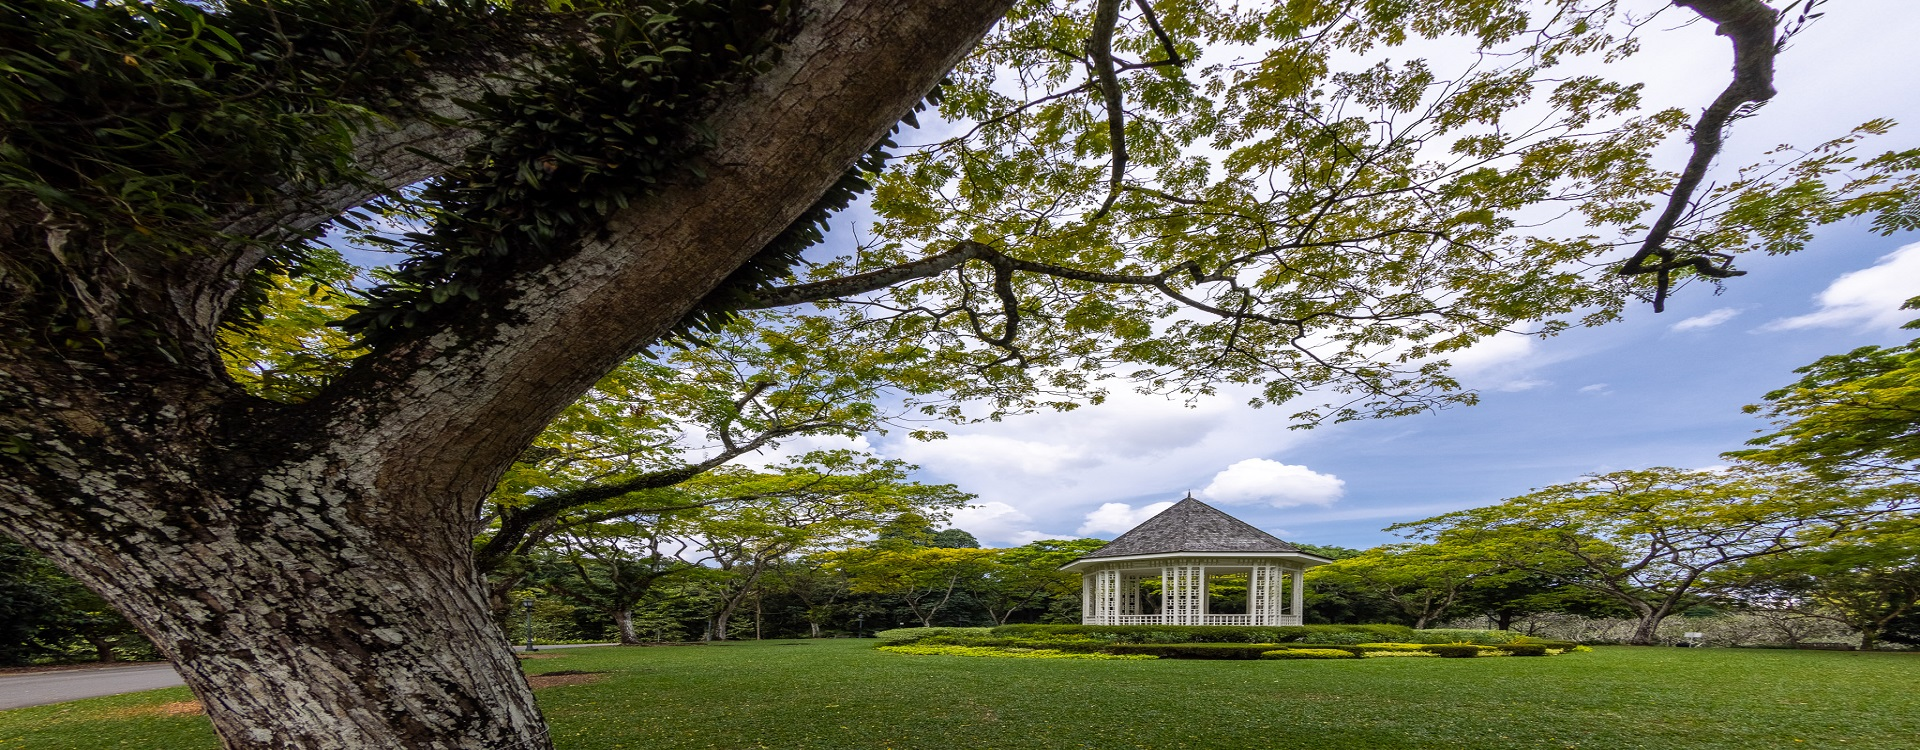 210721-botanic garden-Singapore-150301.jpg